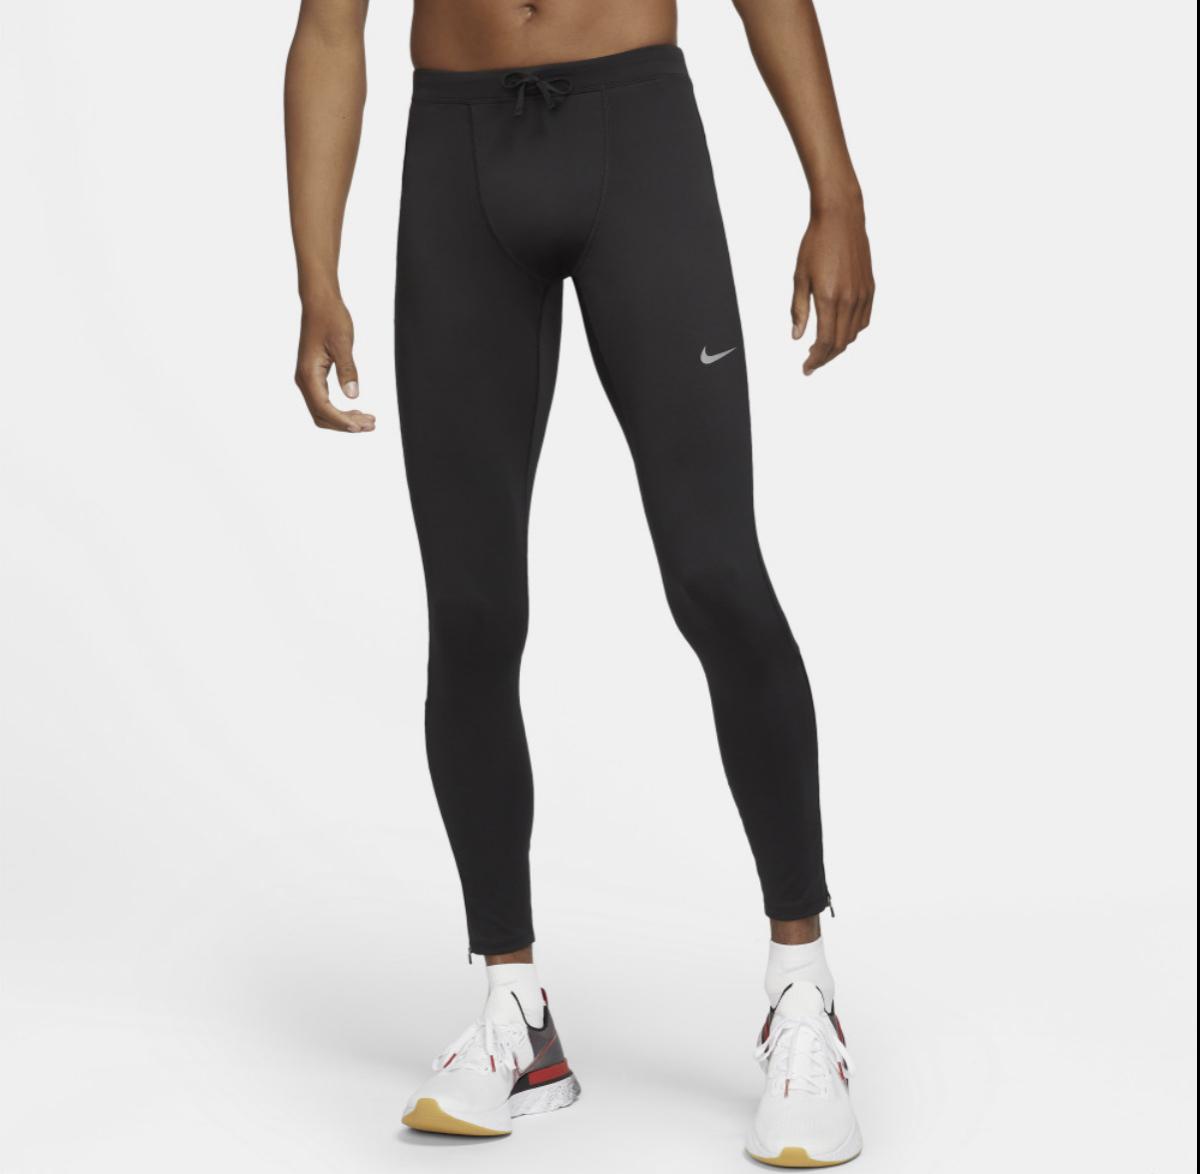 Nike Dri-FIT Challenger